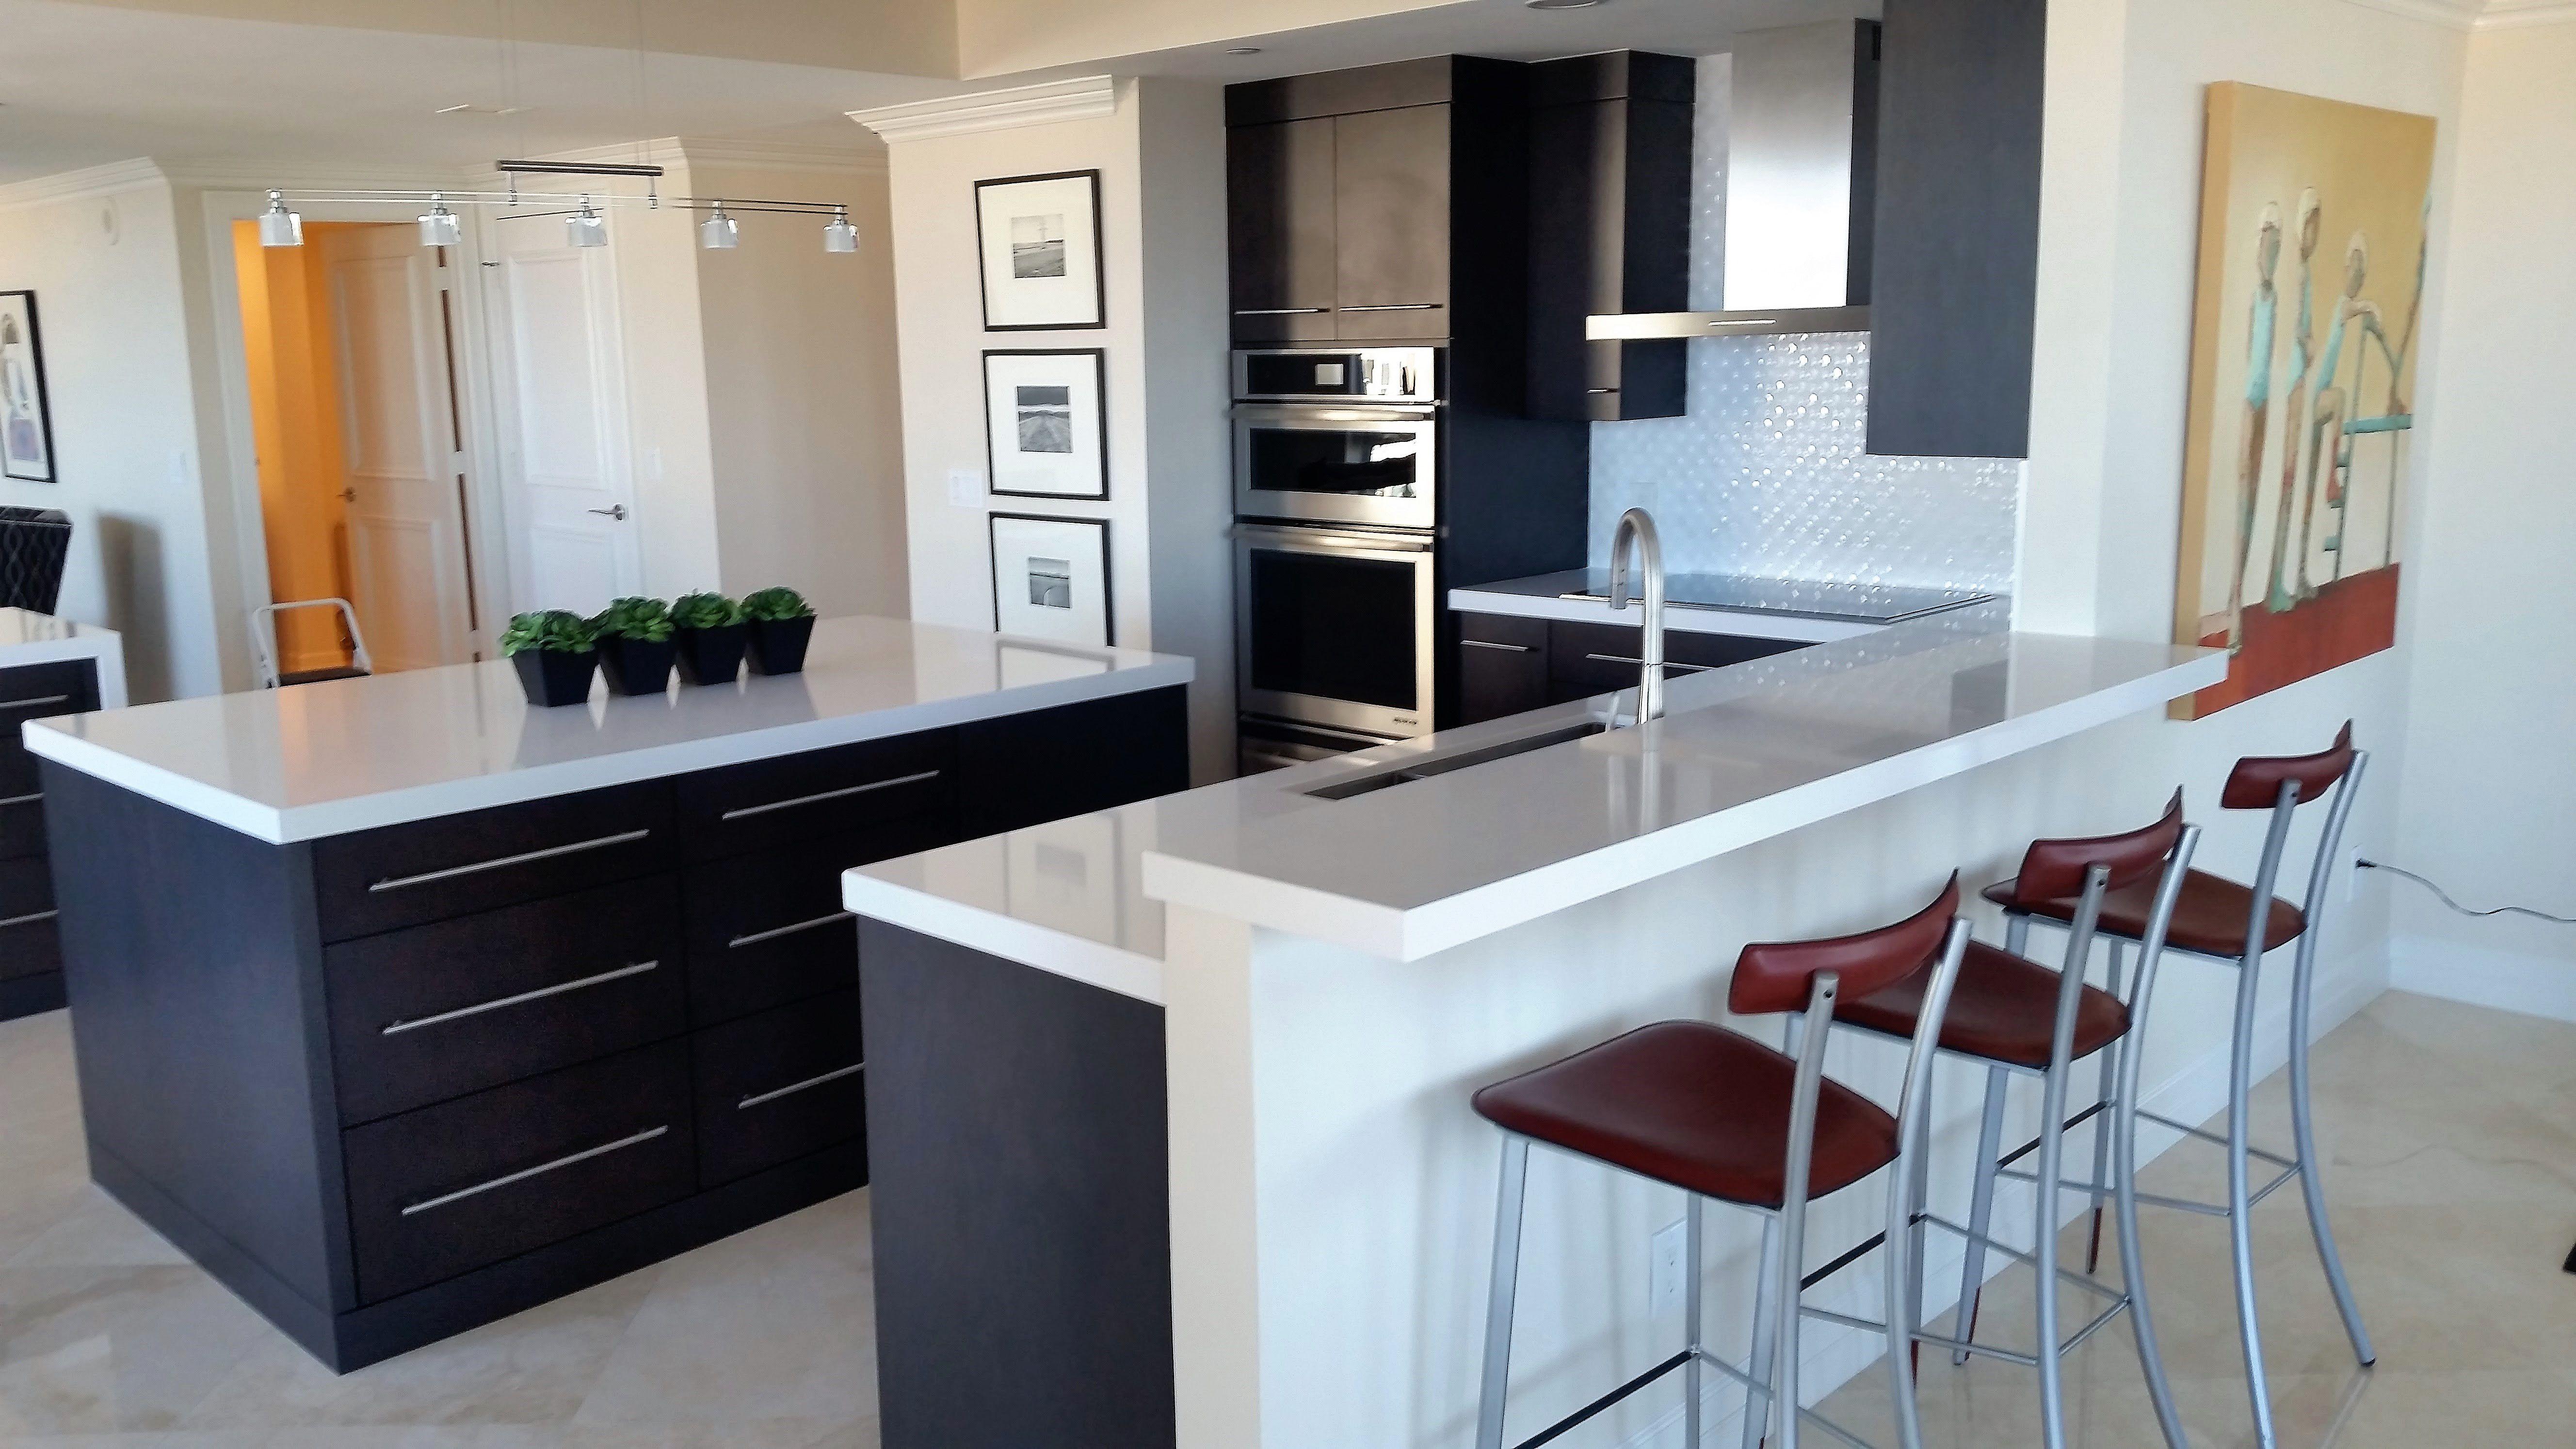 New Kitchens Yogui International Inc